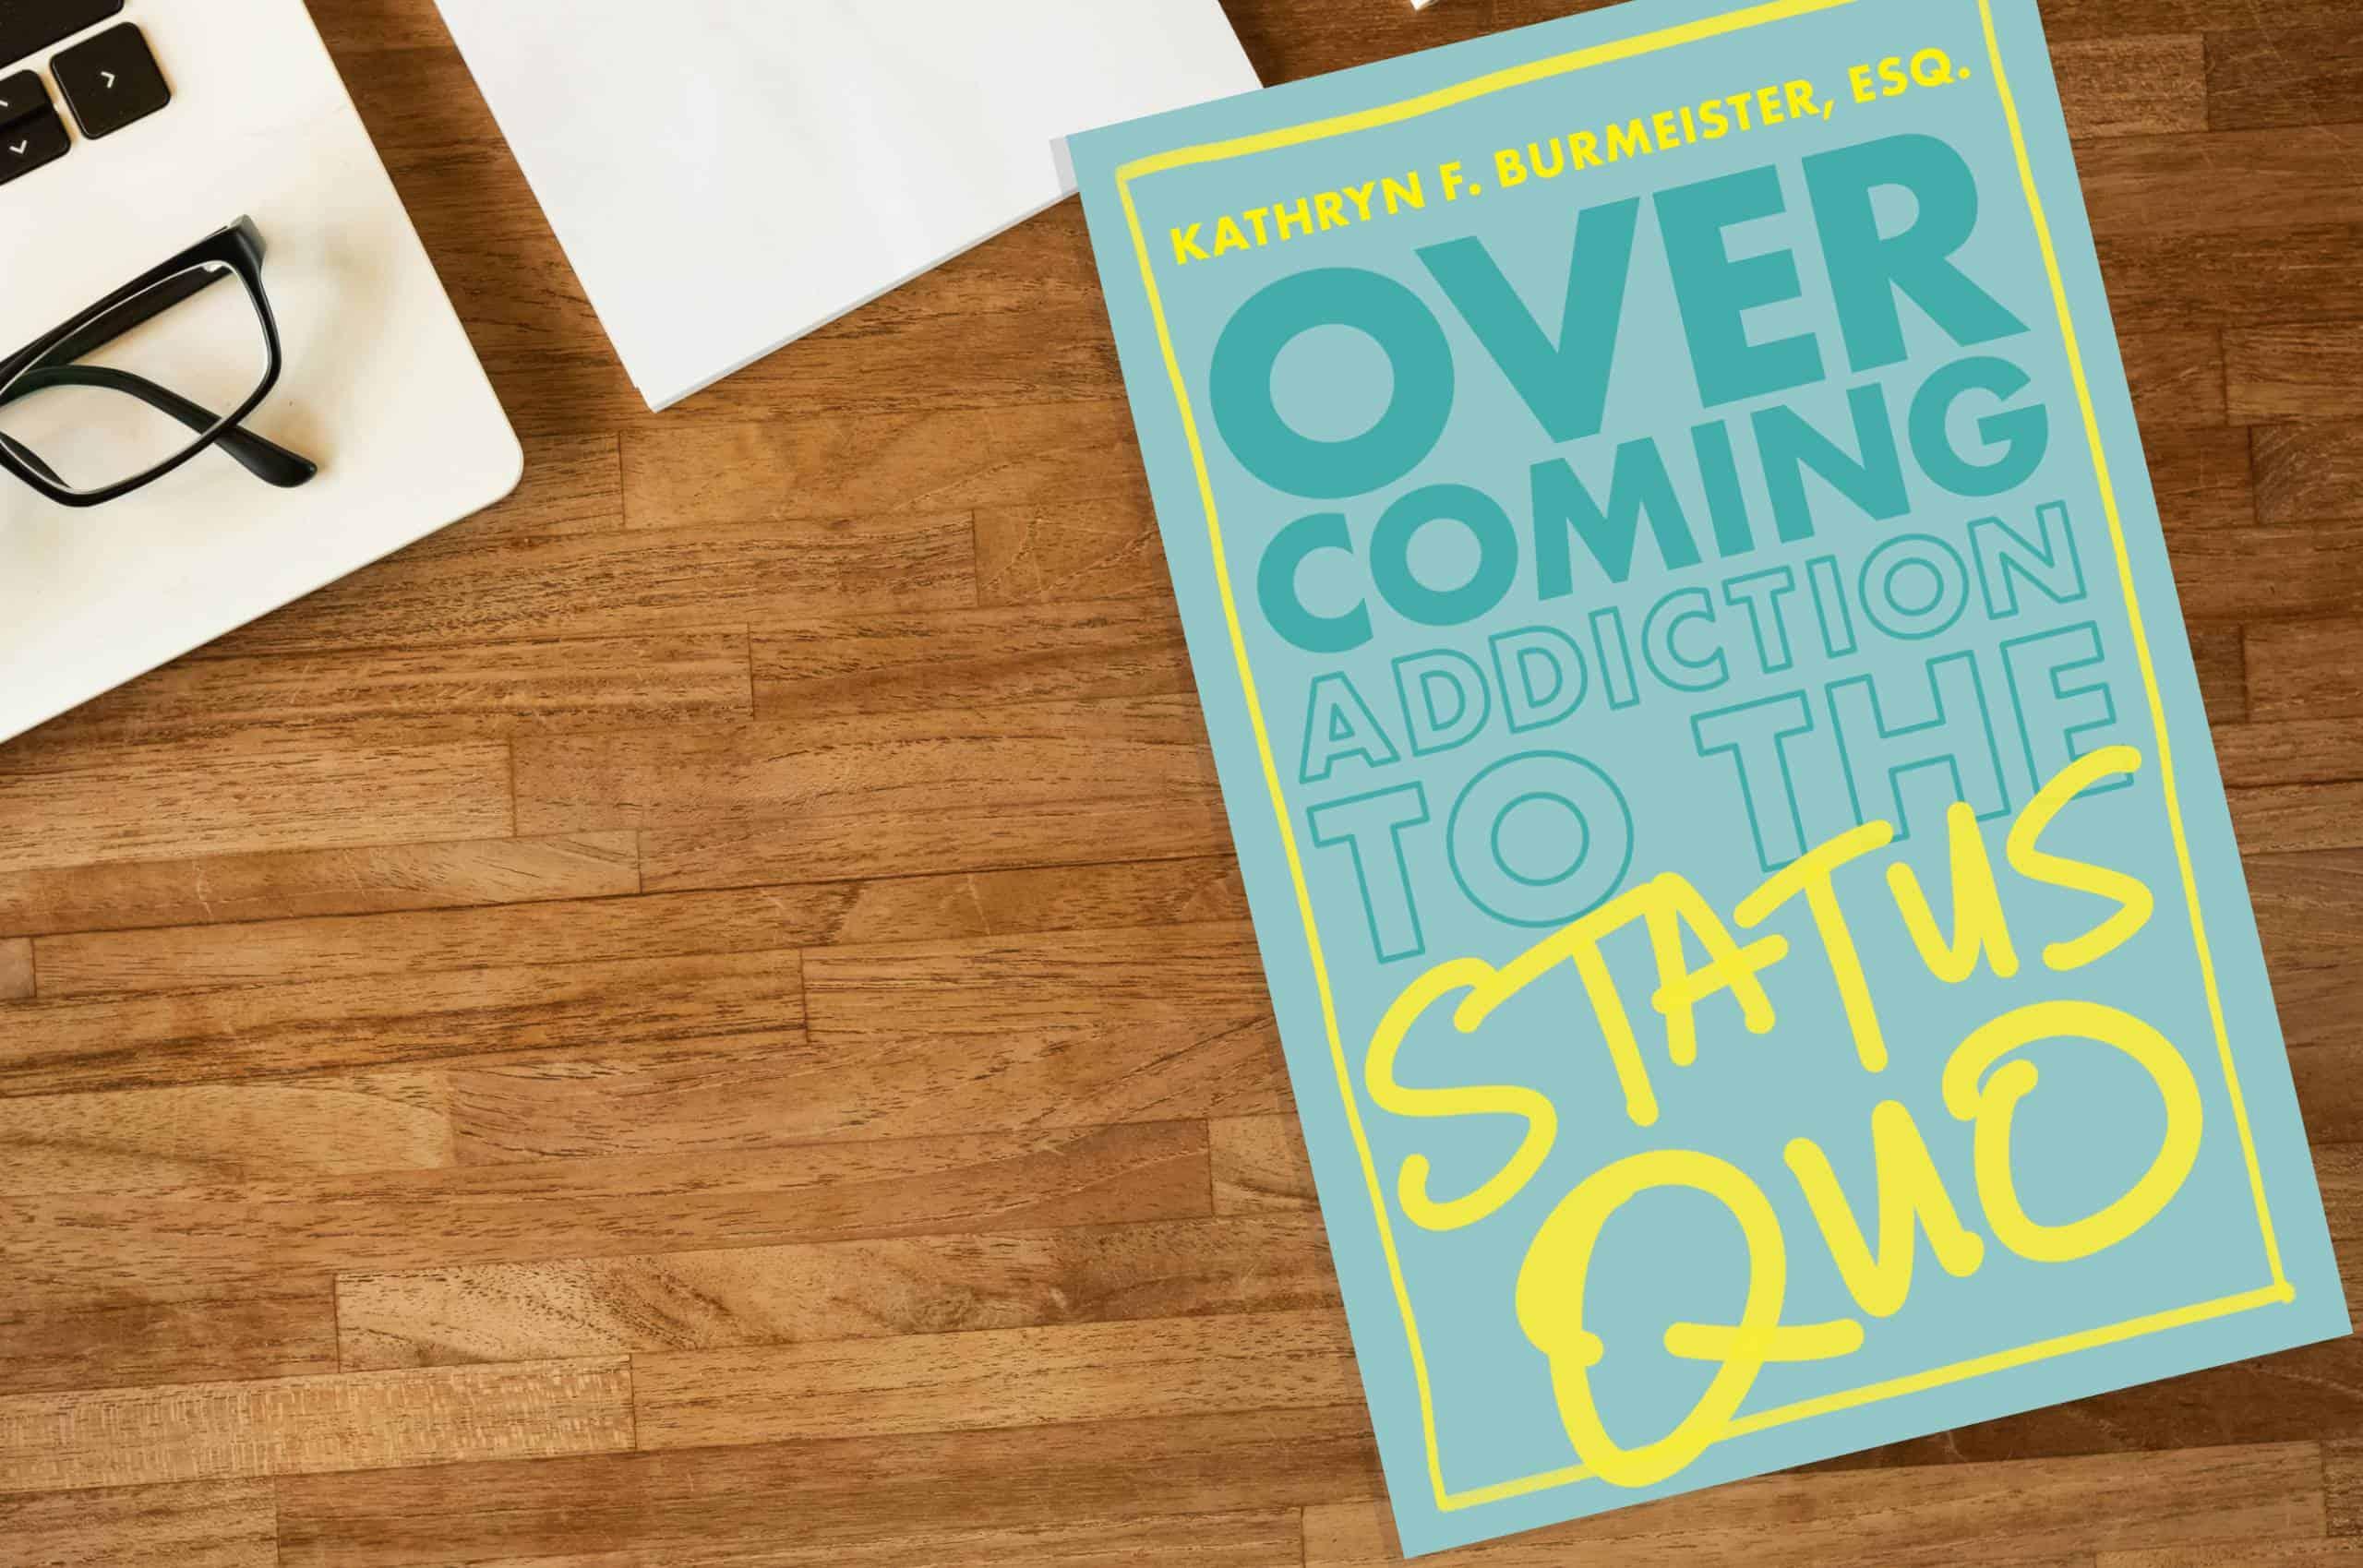 Overcoming Addiction to The Status Quo, Kathrun F Burmeister